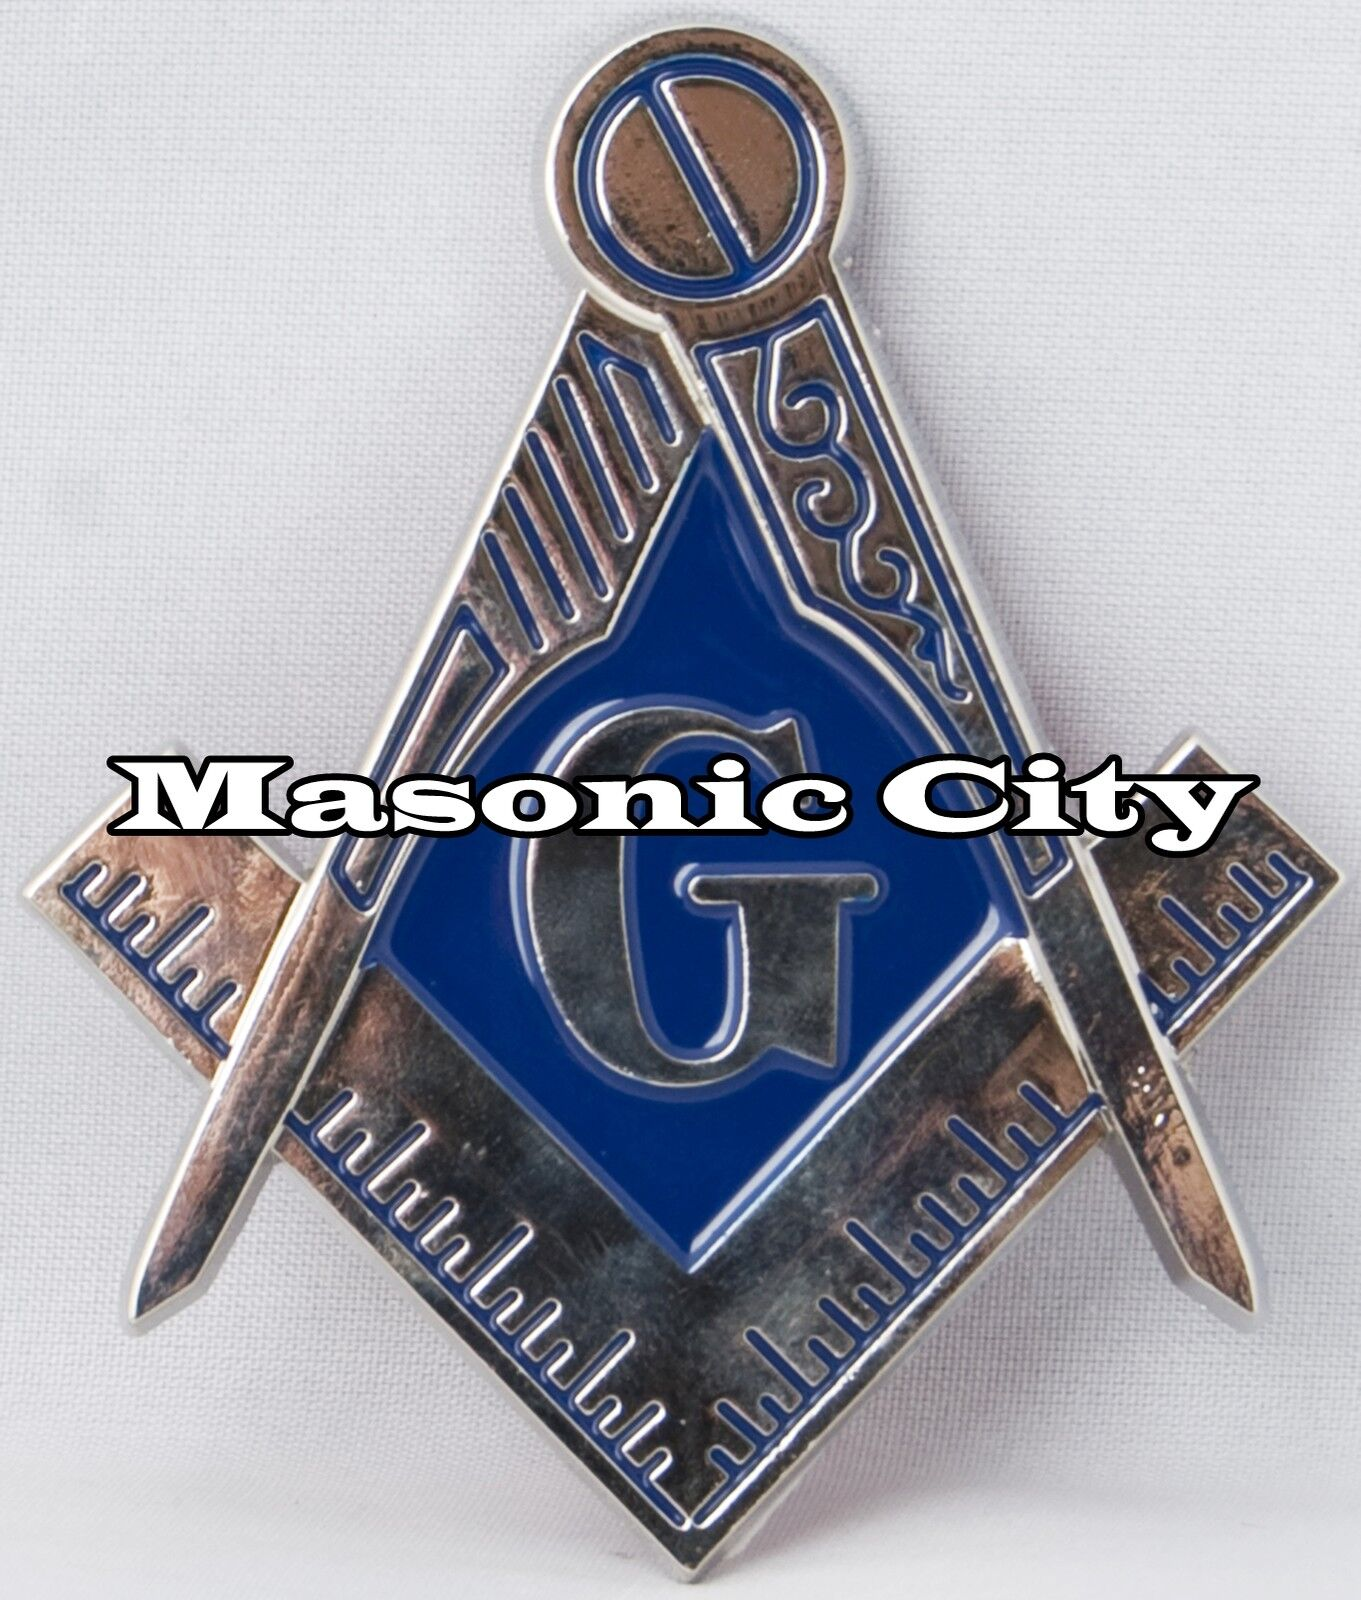 Z-38 Masonic Auto Emblem Freemasonry Car Lodge Mason Black & Accepted for  sale online | eBay